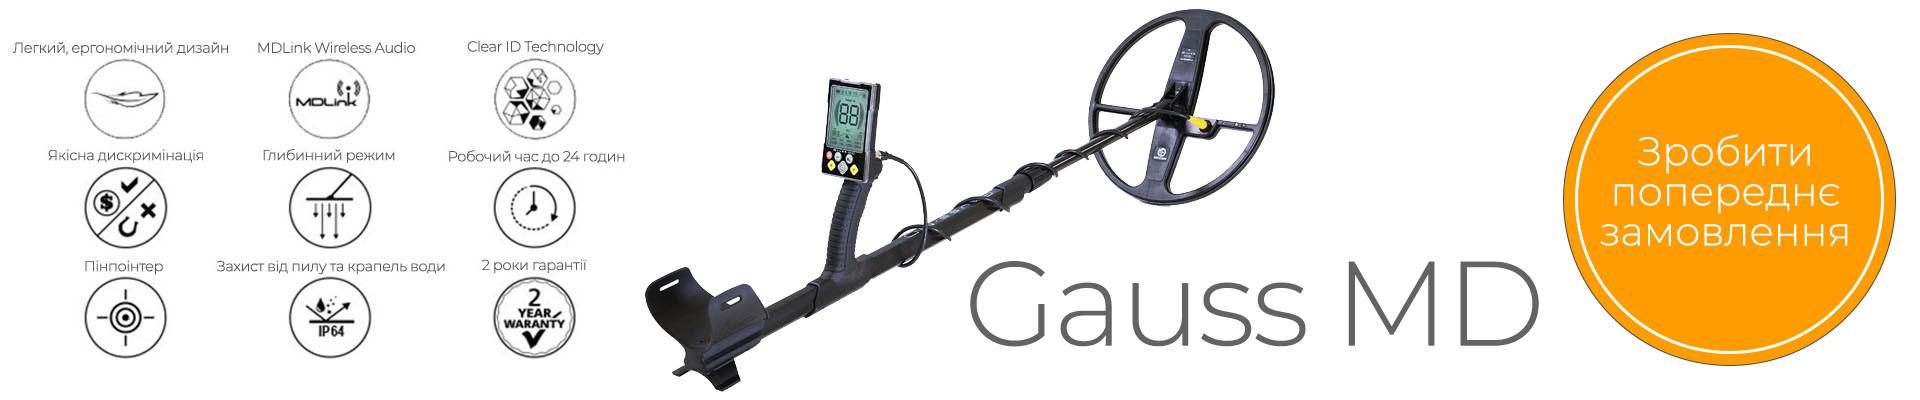 Gauss MD